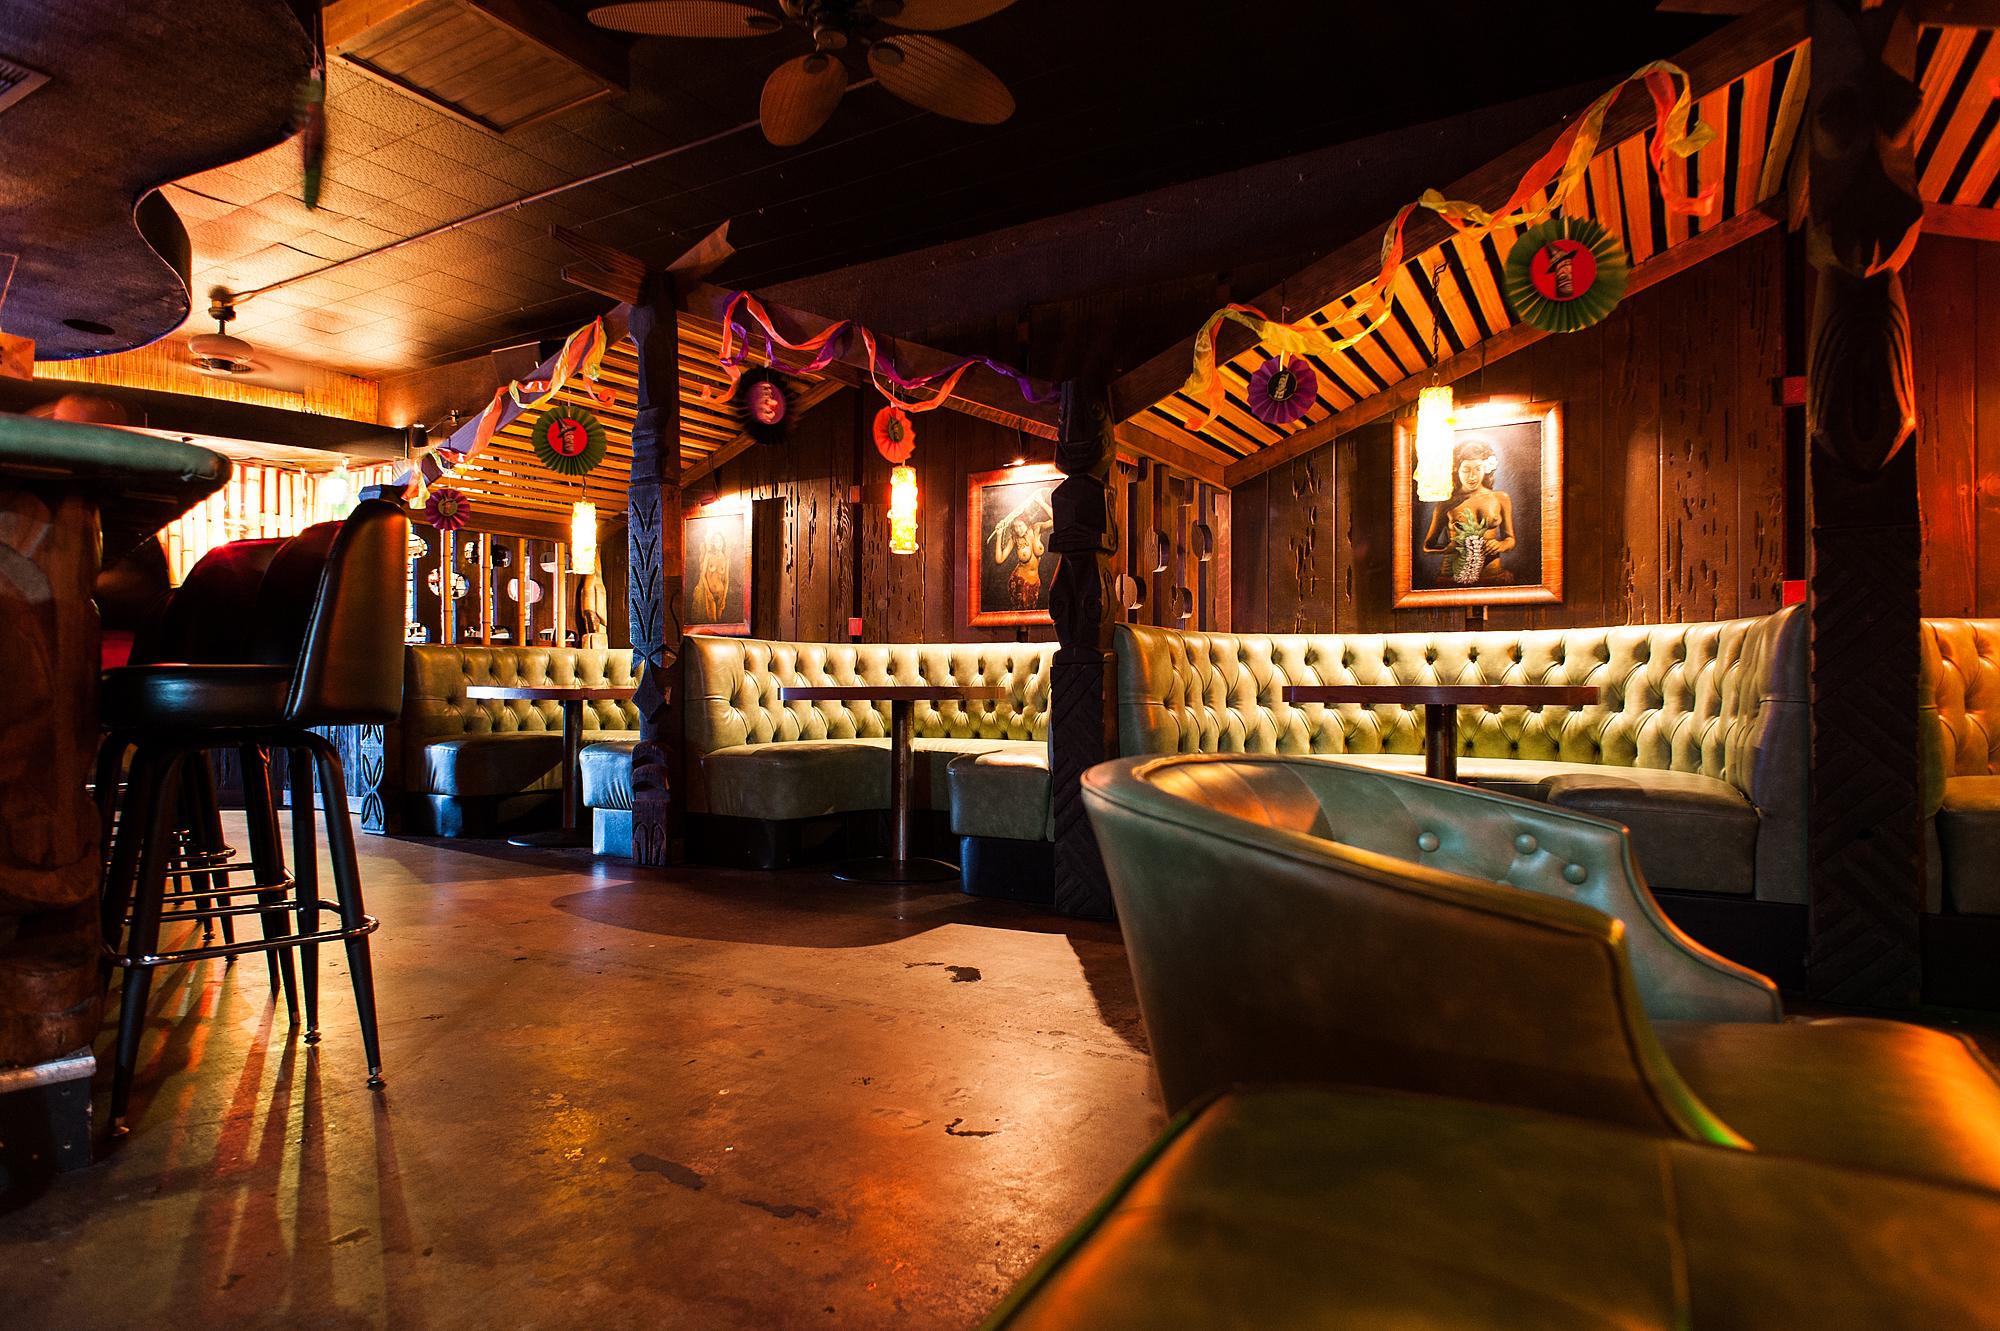 Tonga Hut La S Oldest Tiki Bar Has Become Its Greatest